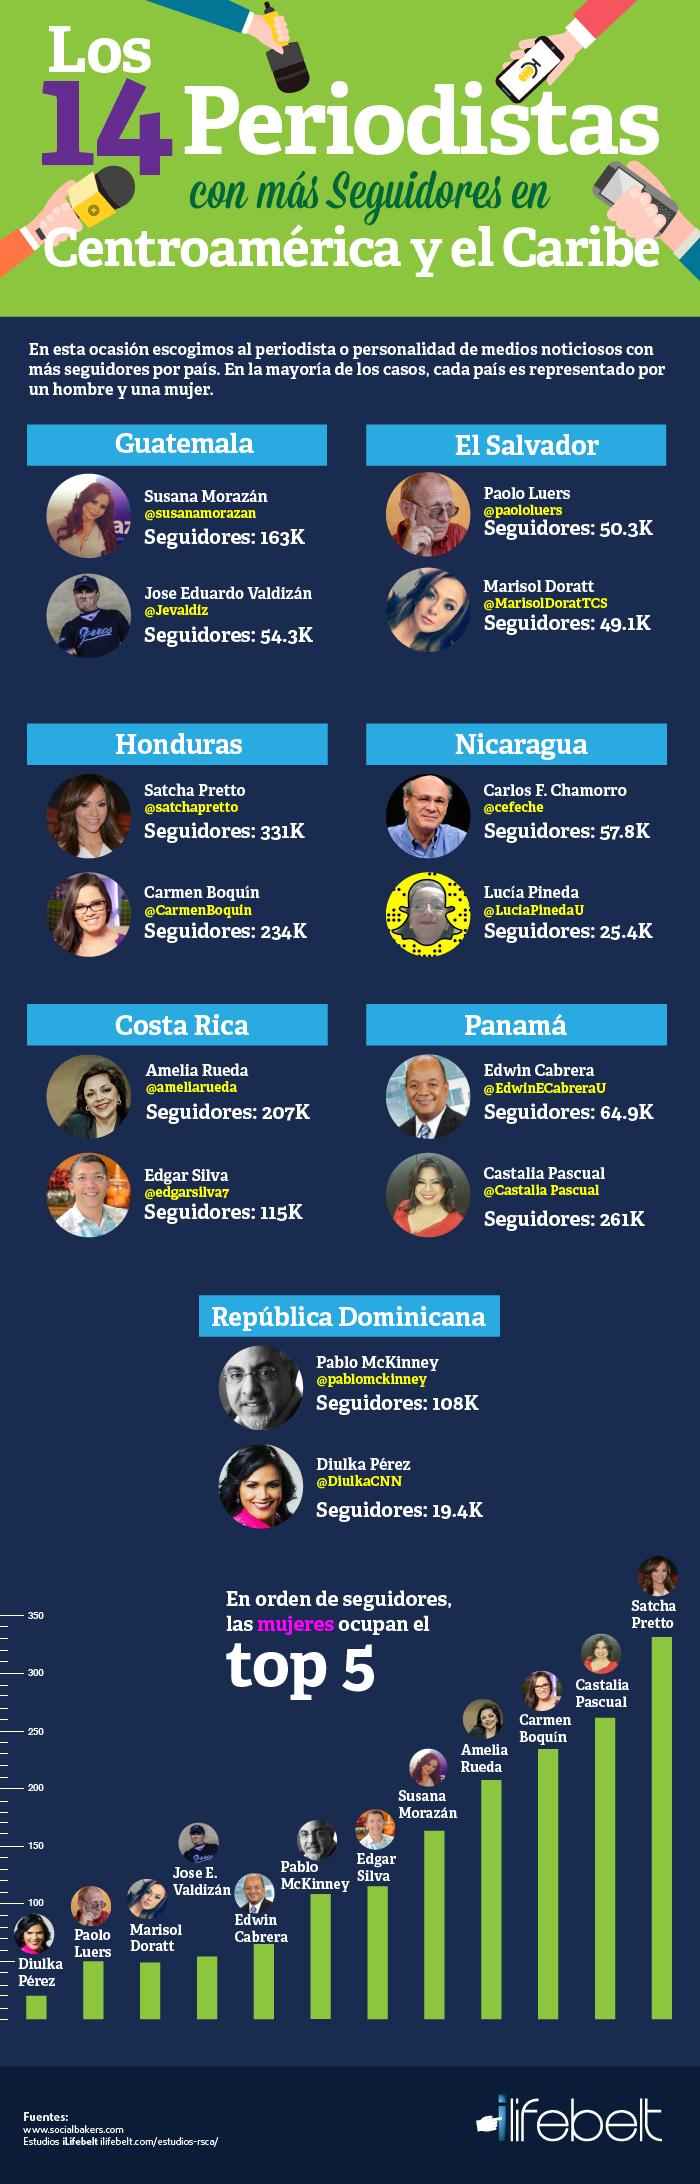 Infografia-Periodistas-Mas-Seguidores-Centroamerica-Twitter